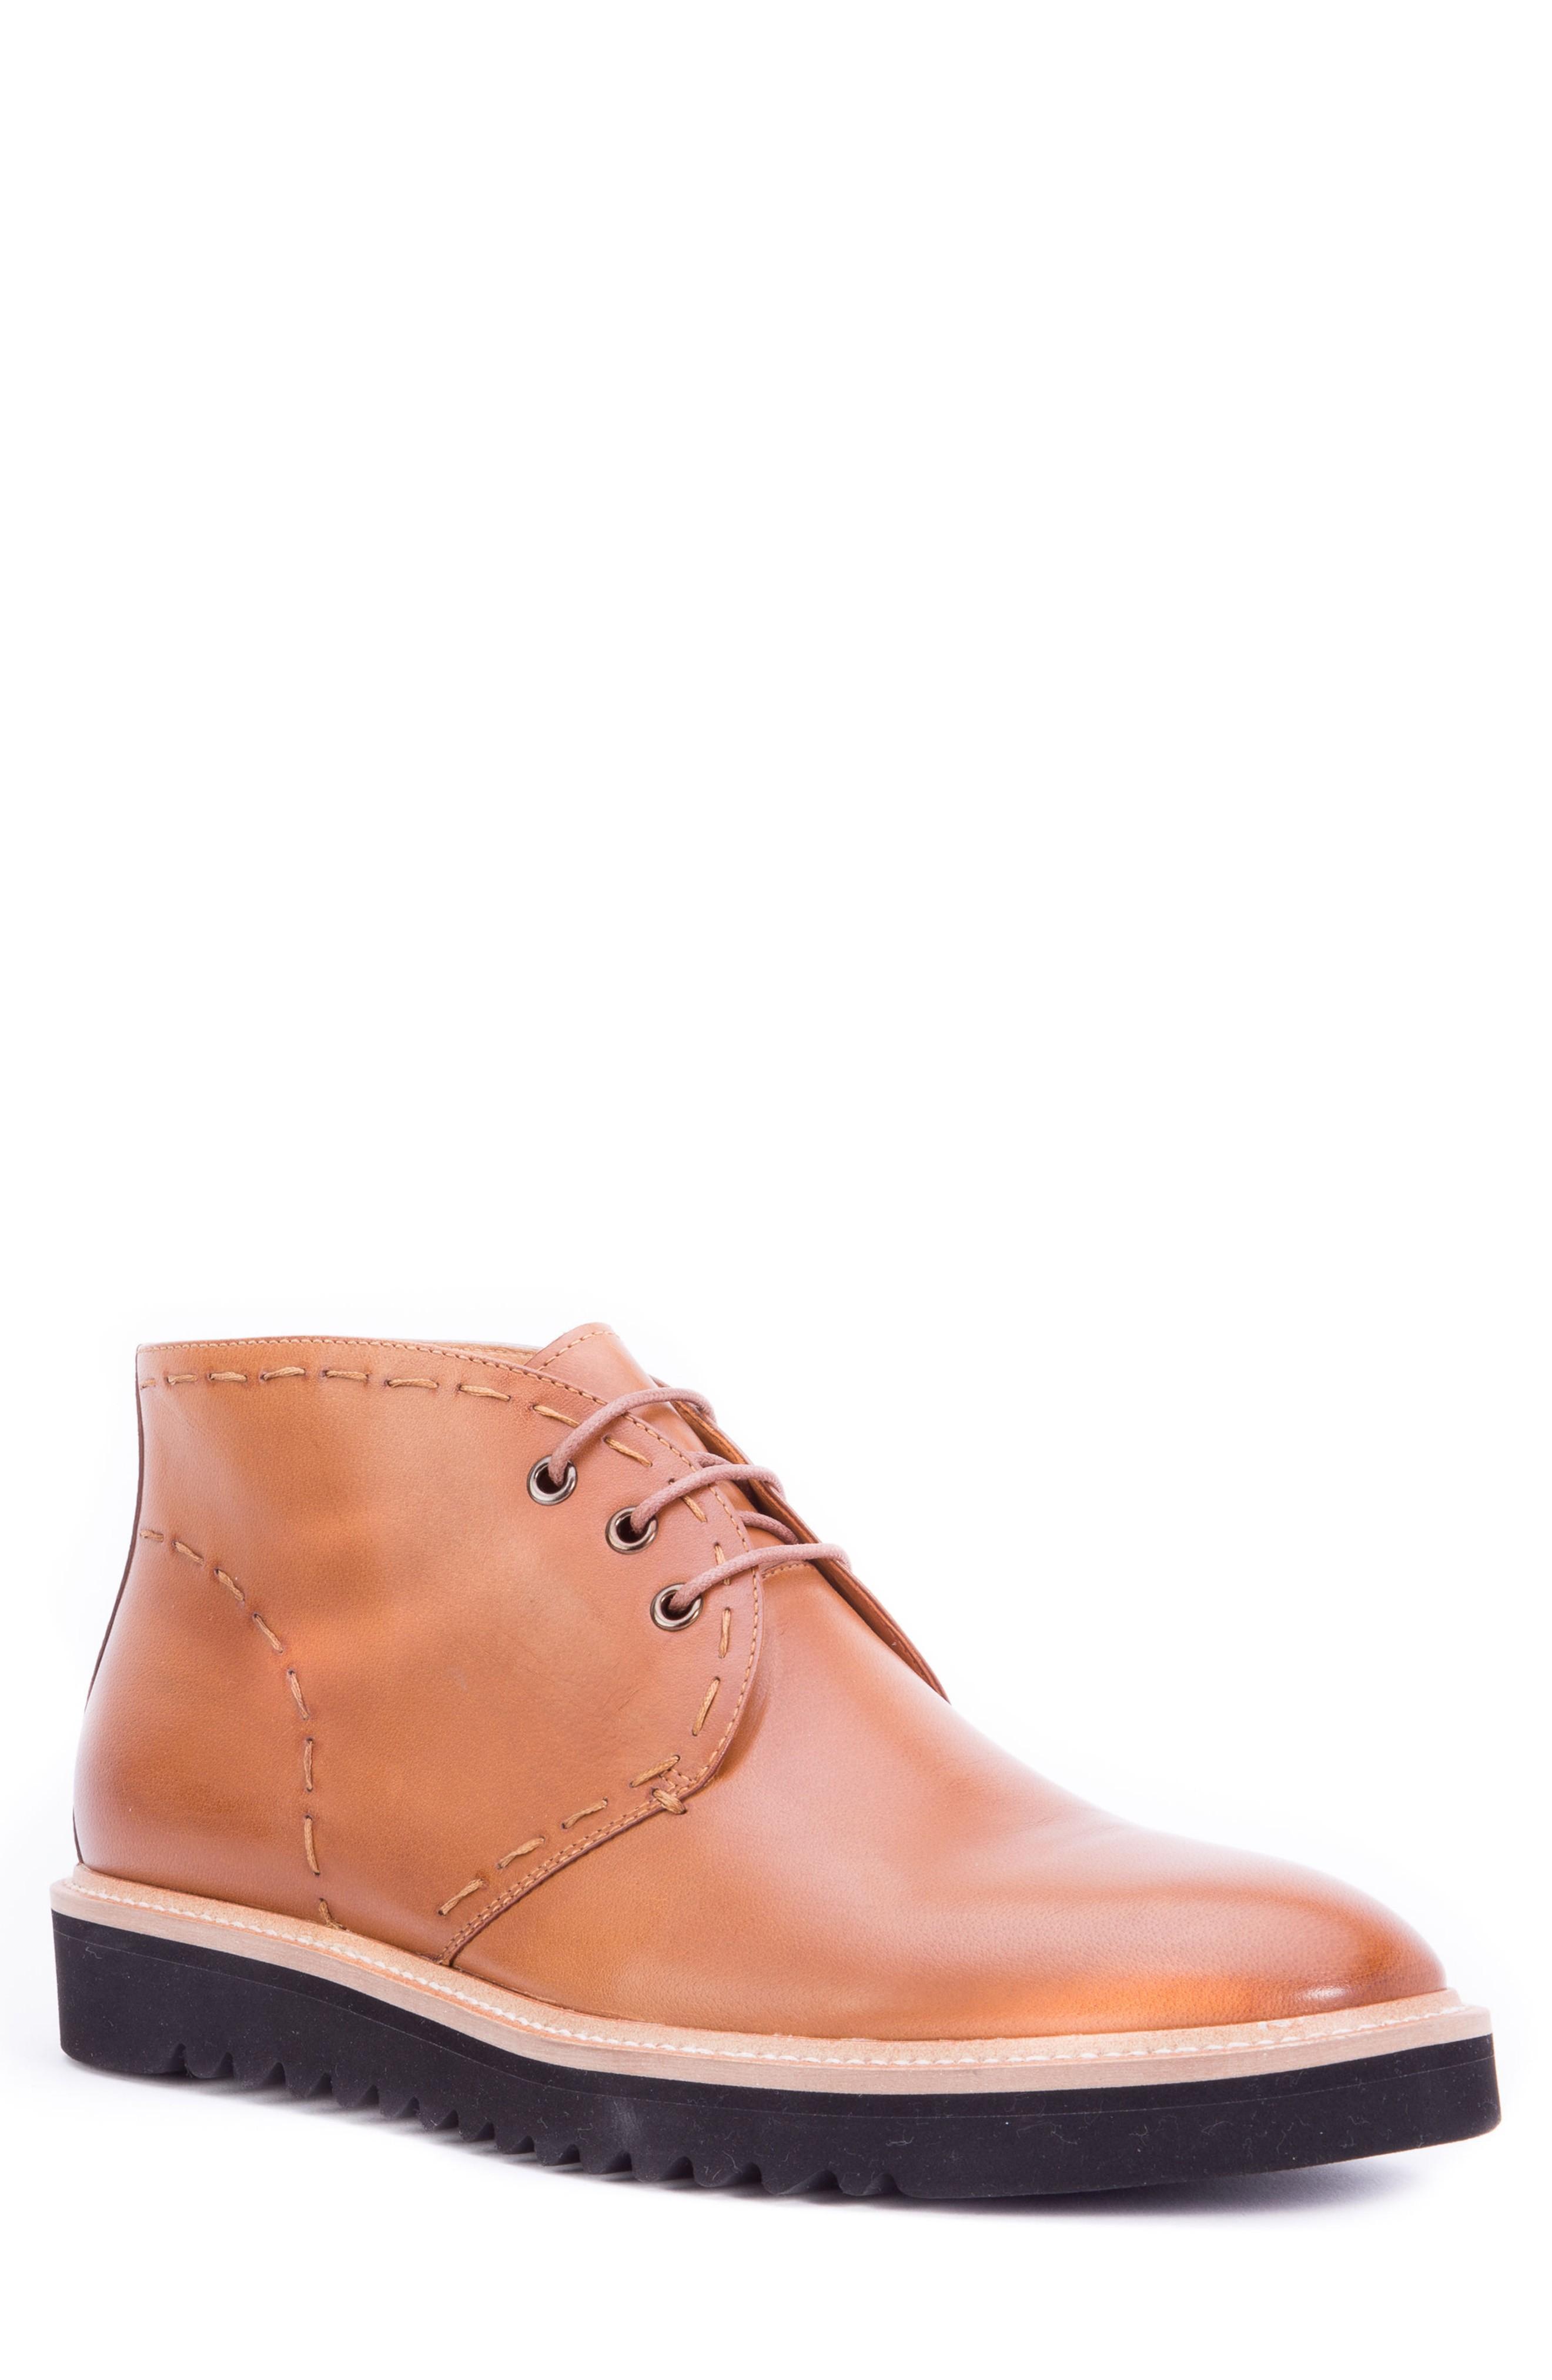 Zanzara Lombardo Chukka Boot In Cognac Leather